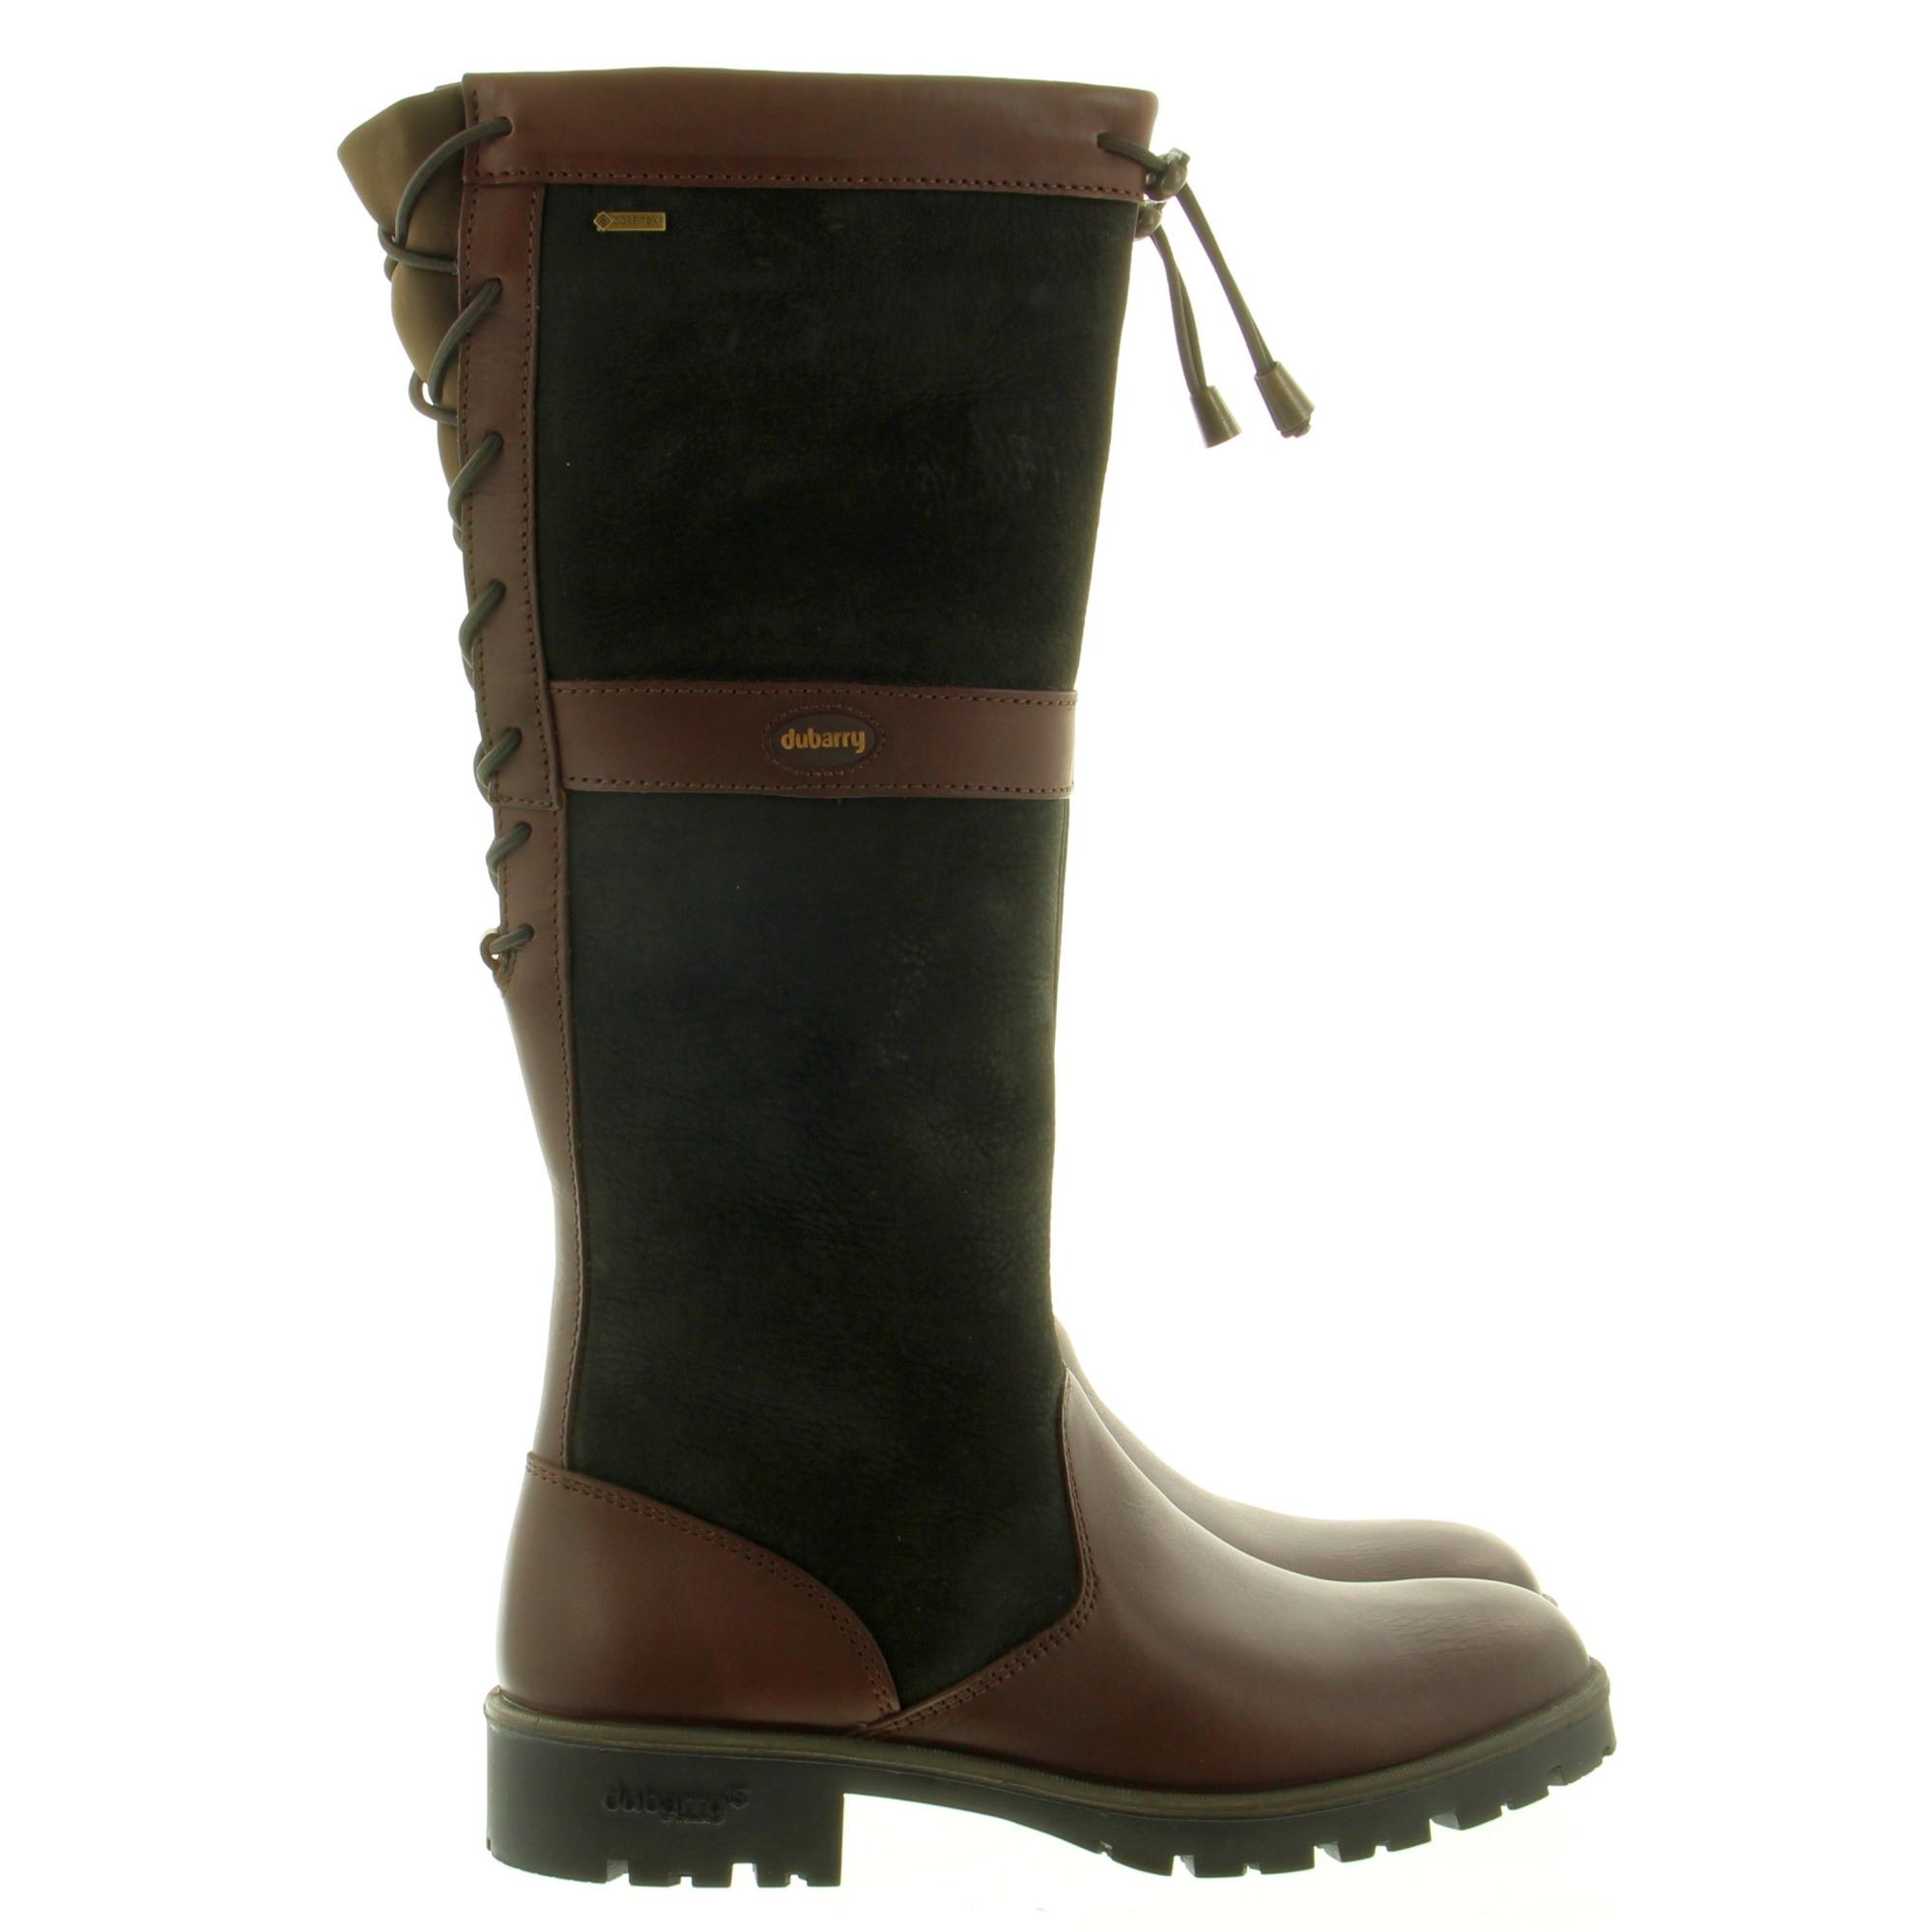 Dubarry Glanmire 3944 12 Black Brown